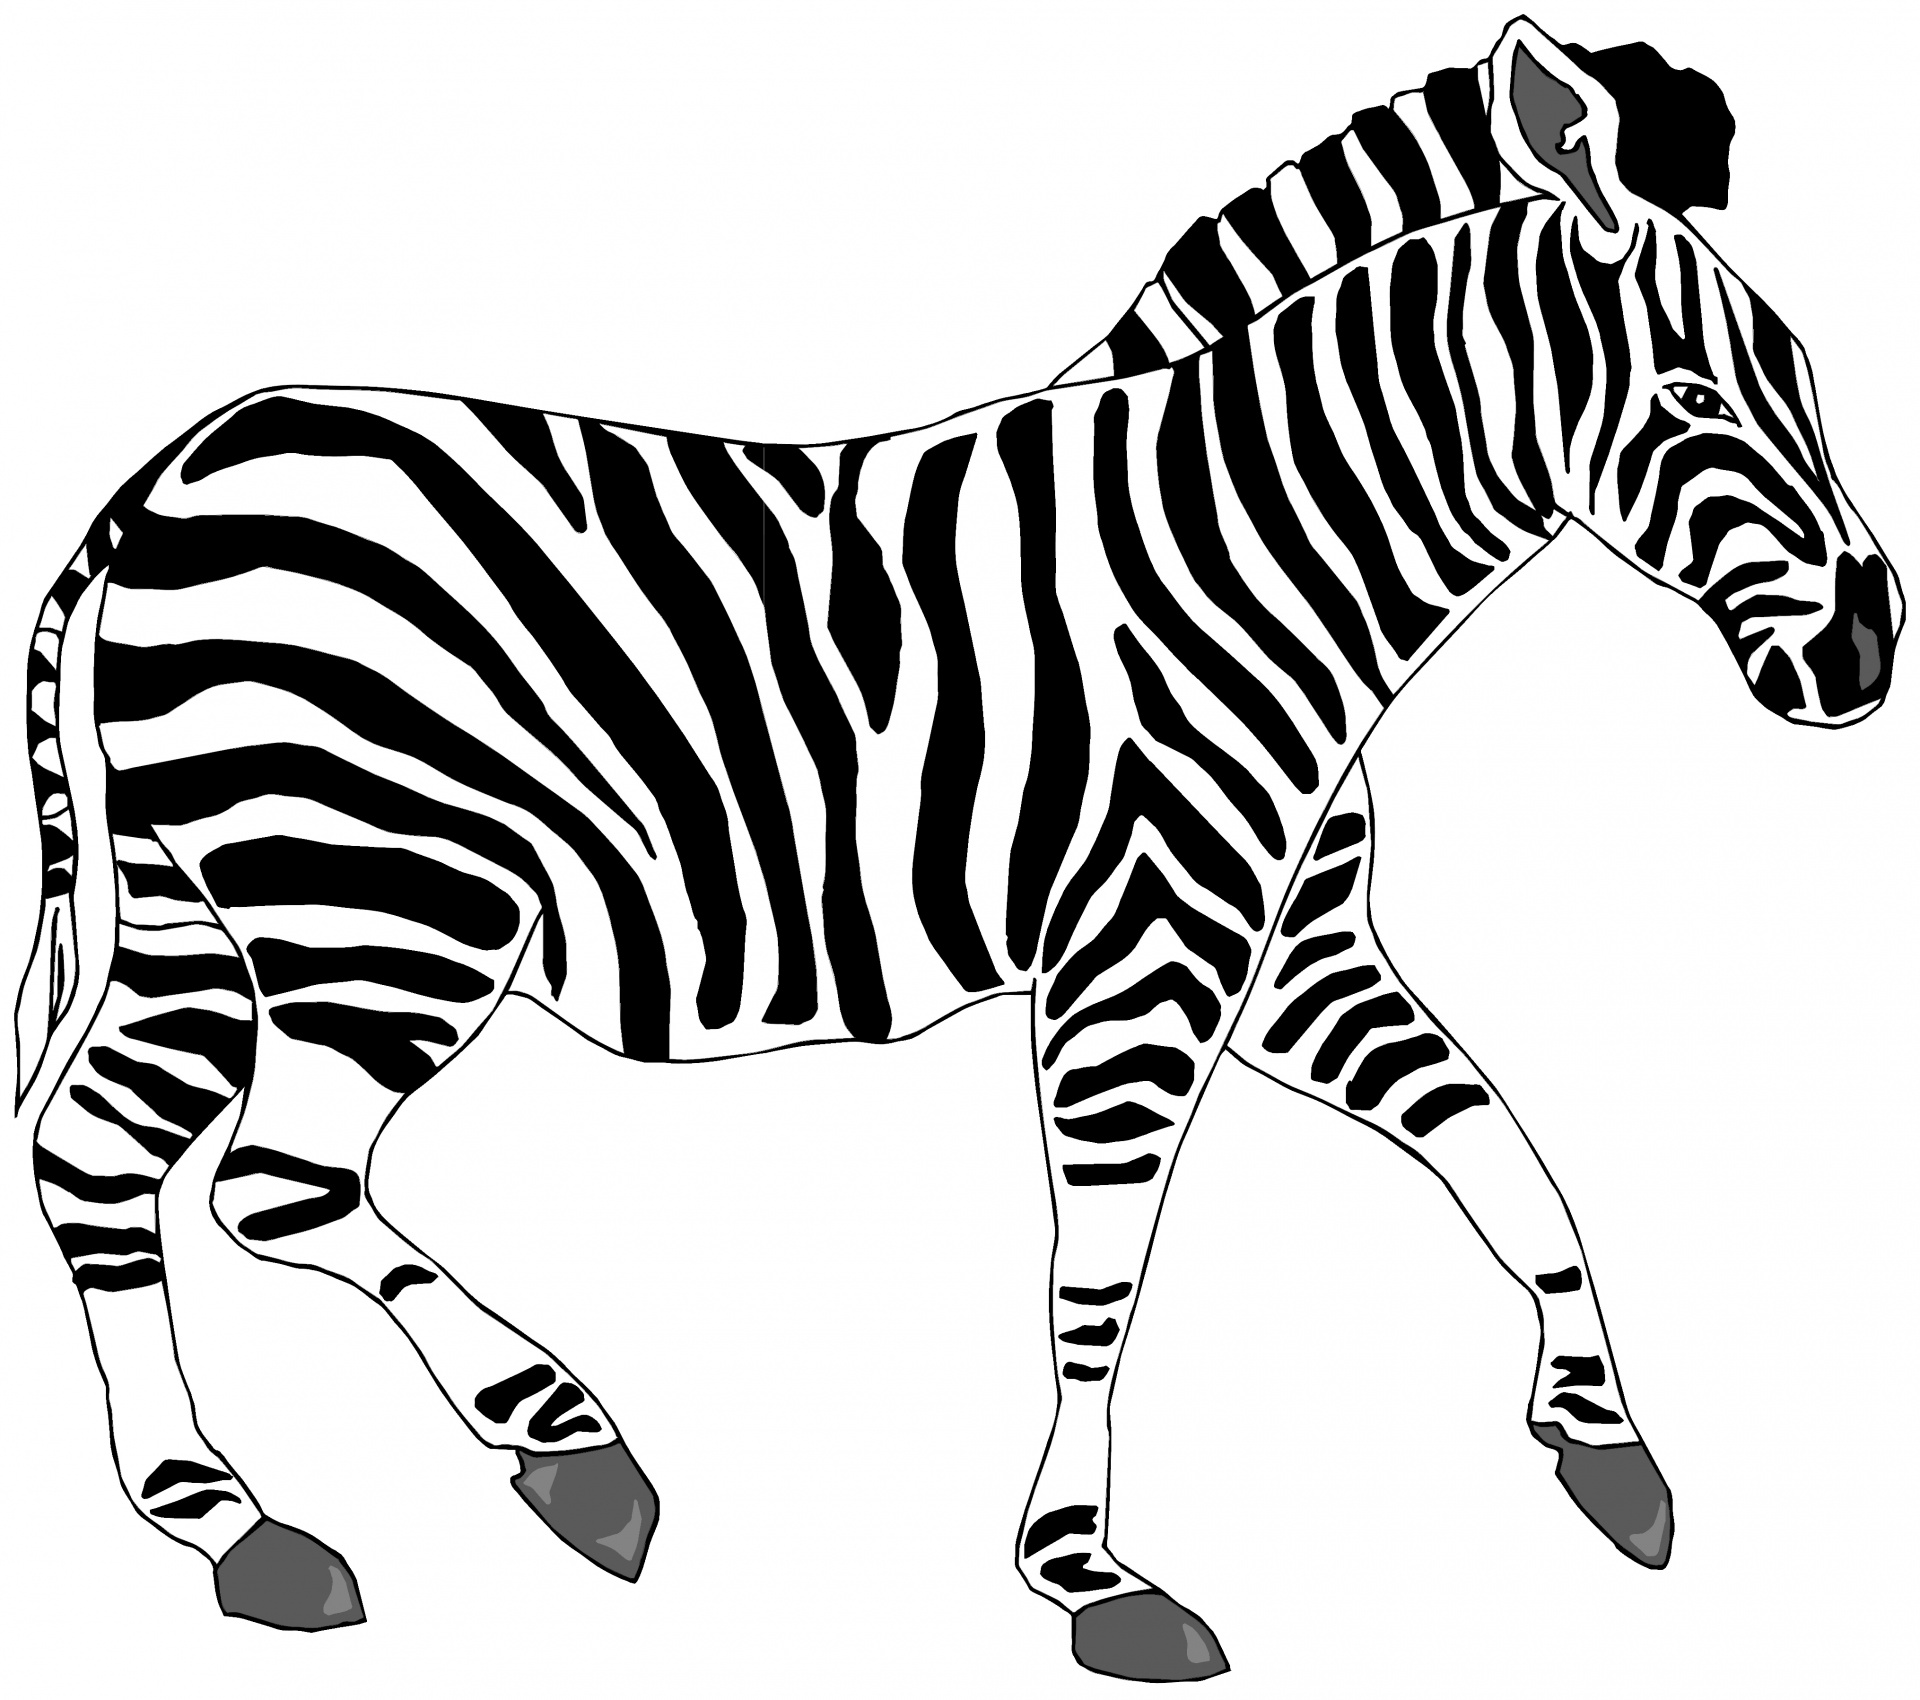 1920x1700 Silhouette Of An Animal Free Stock Photo